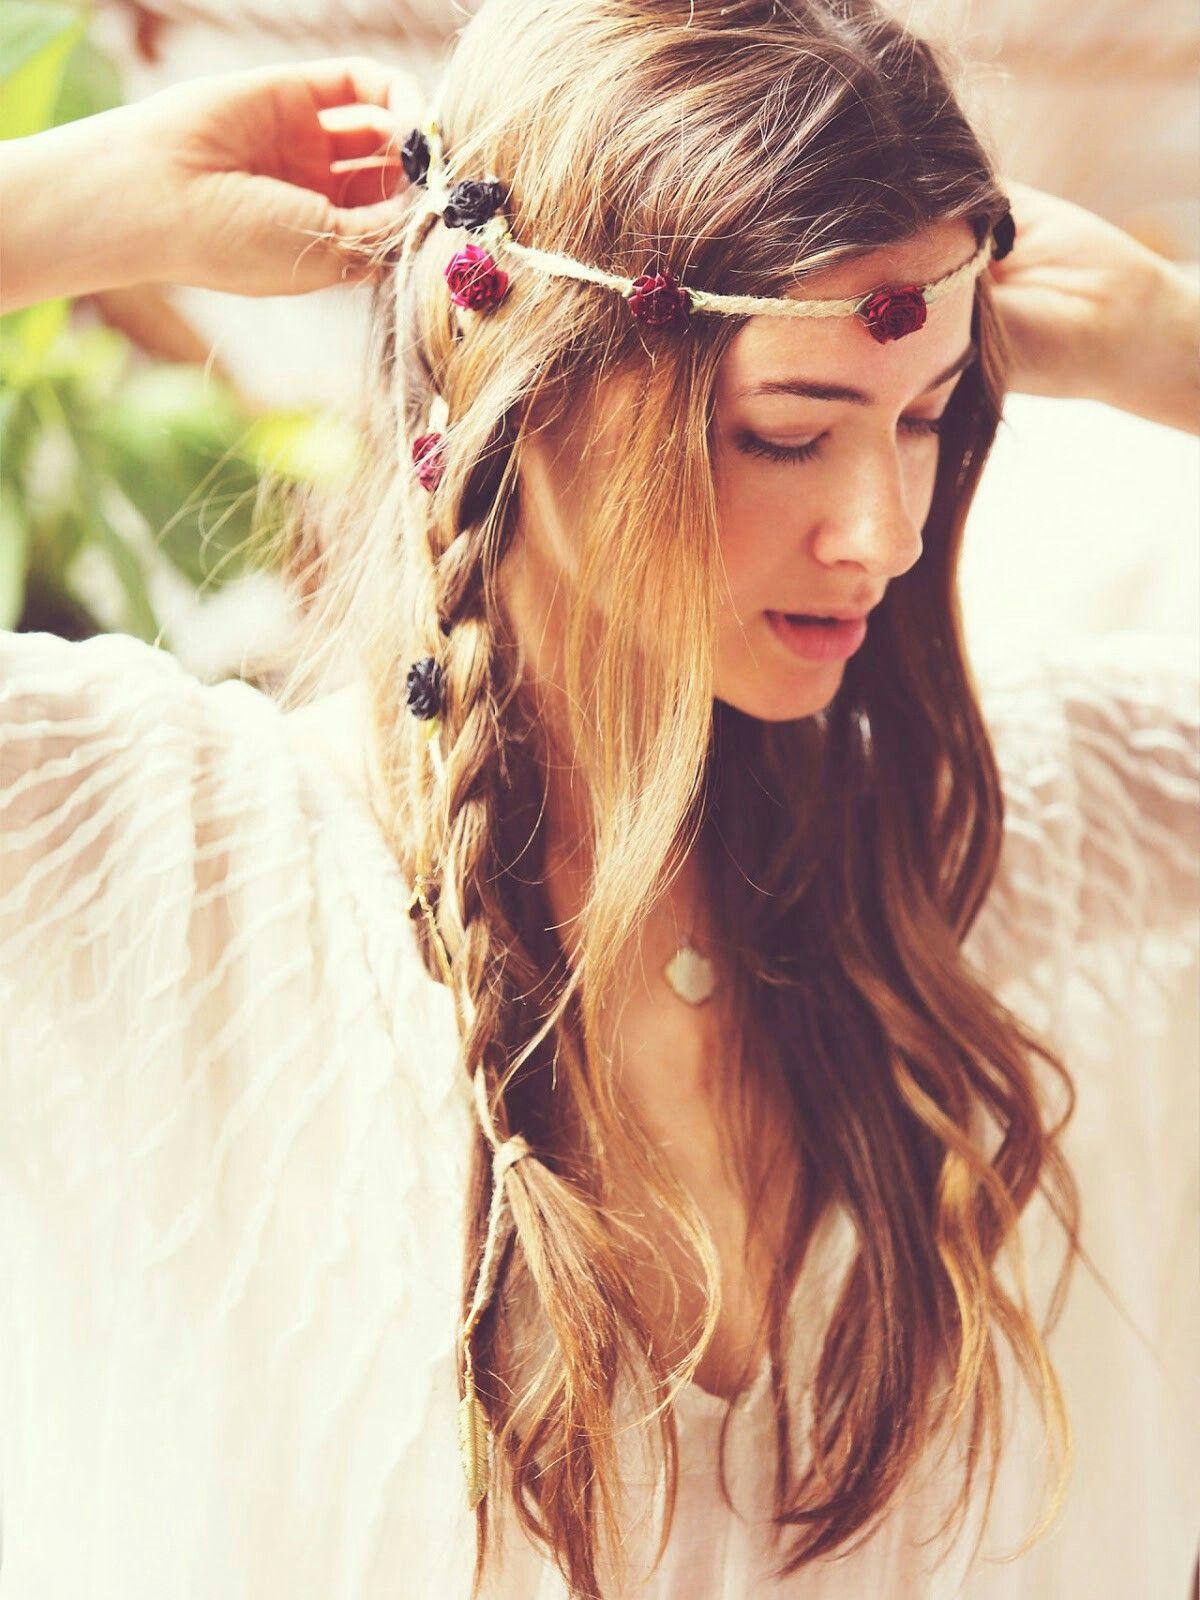 Boho Inspiration Boho Hippie Lifestyle Modern Hippie Life Boho Life Bohemian Style Hippie Hair Boho Braided Hairstyles Bohemian Hairstyles